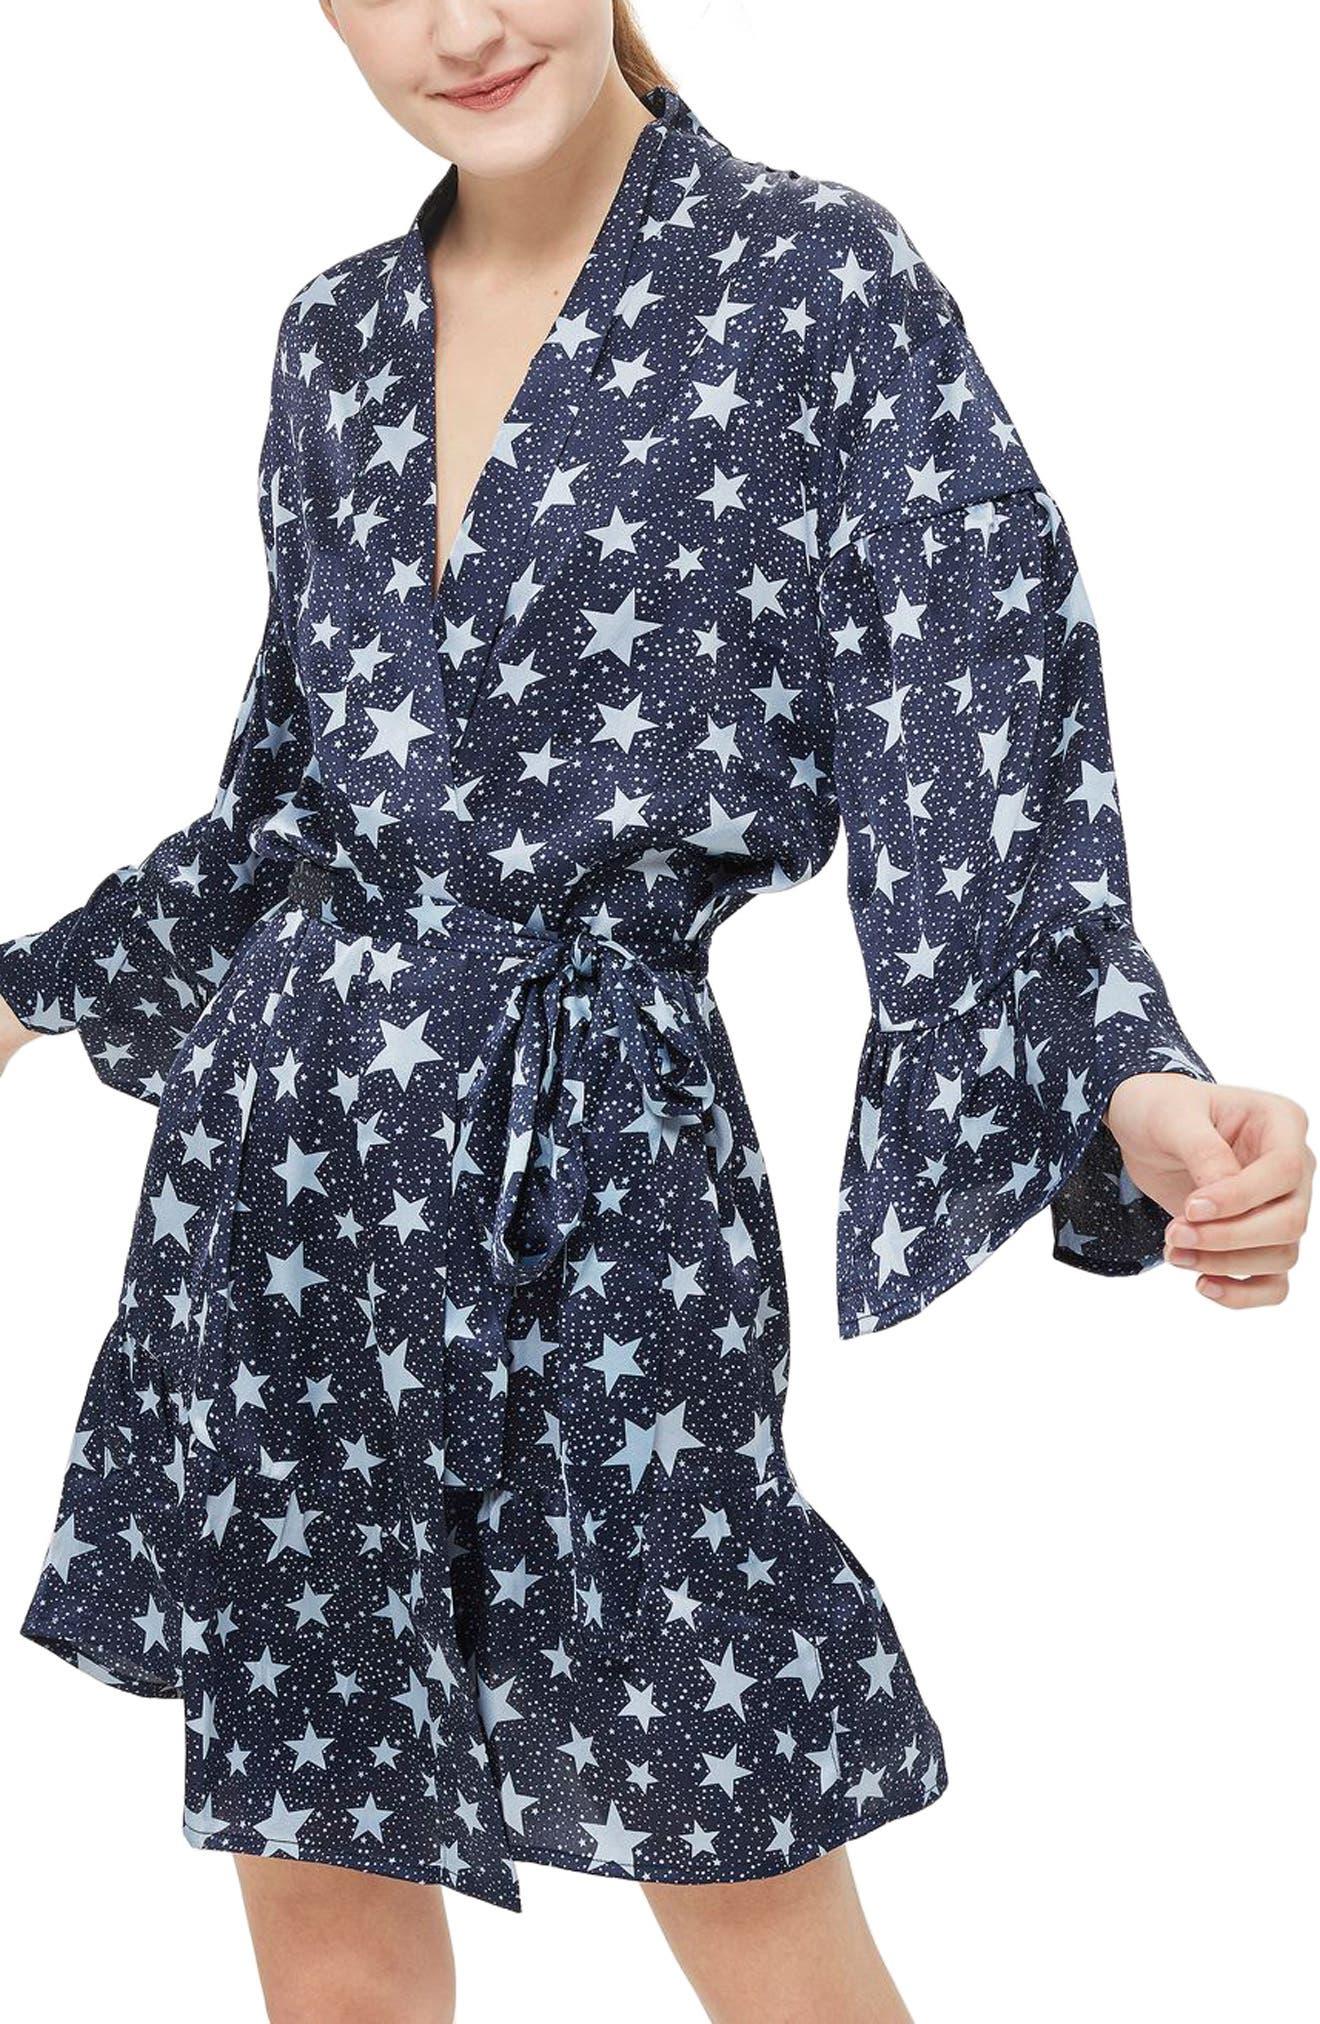 Star Satin Short Robe,                         Main,                         color, 410